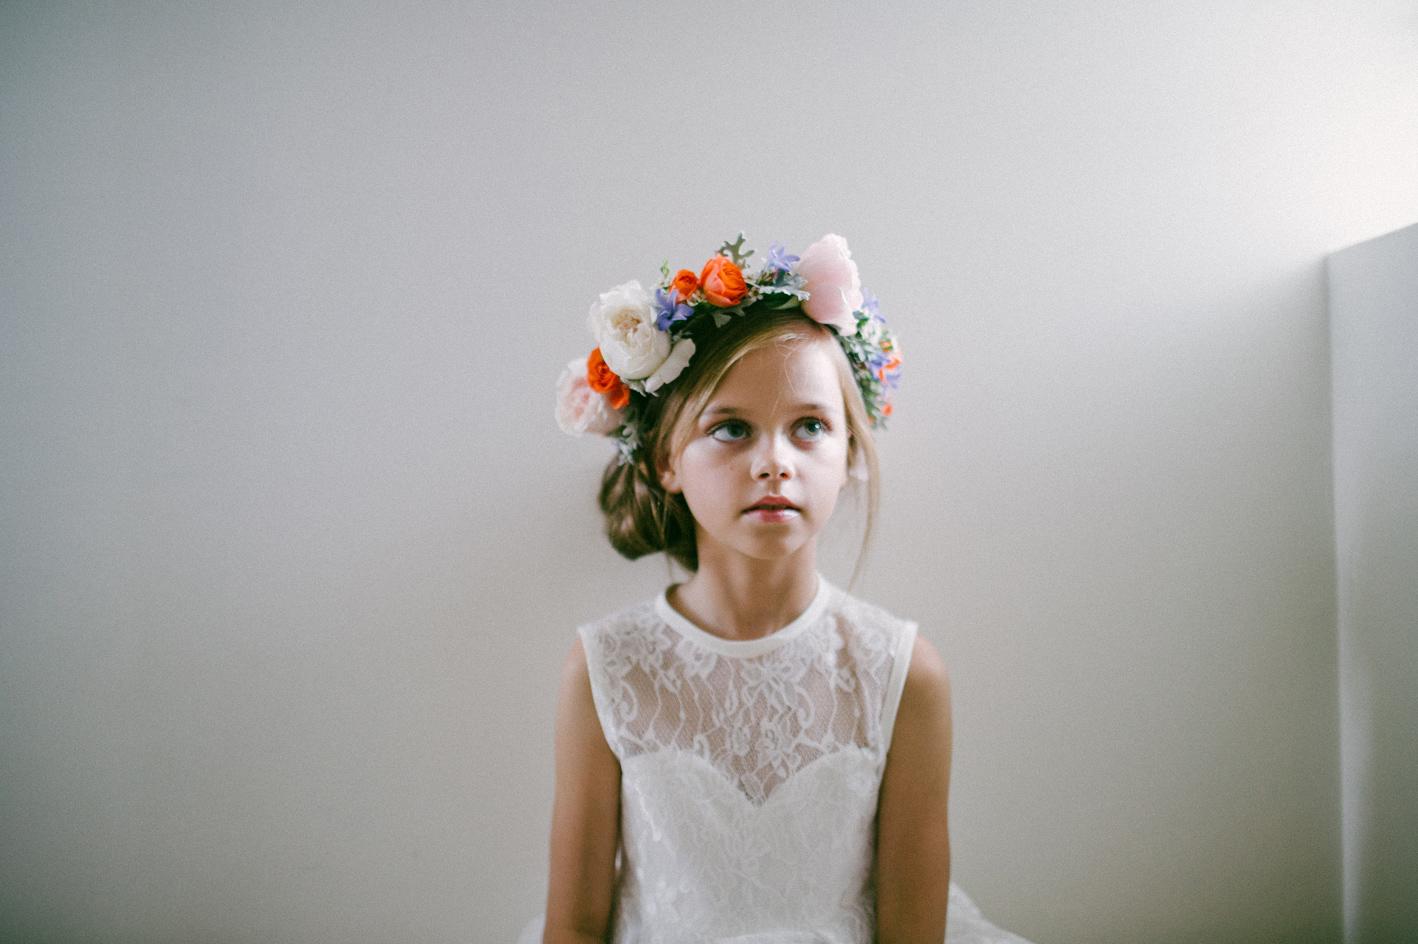 021-crown-of-eden-sophie-baker-photography